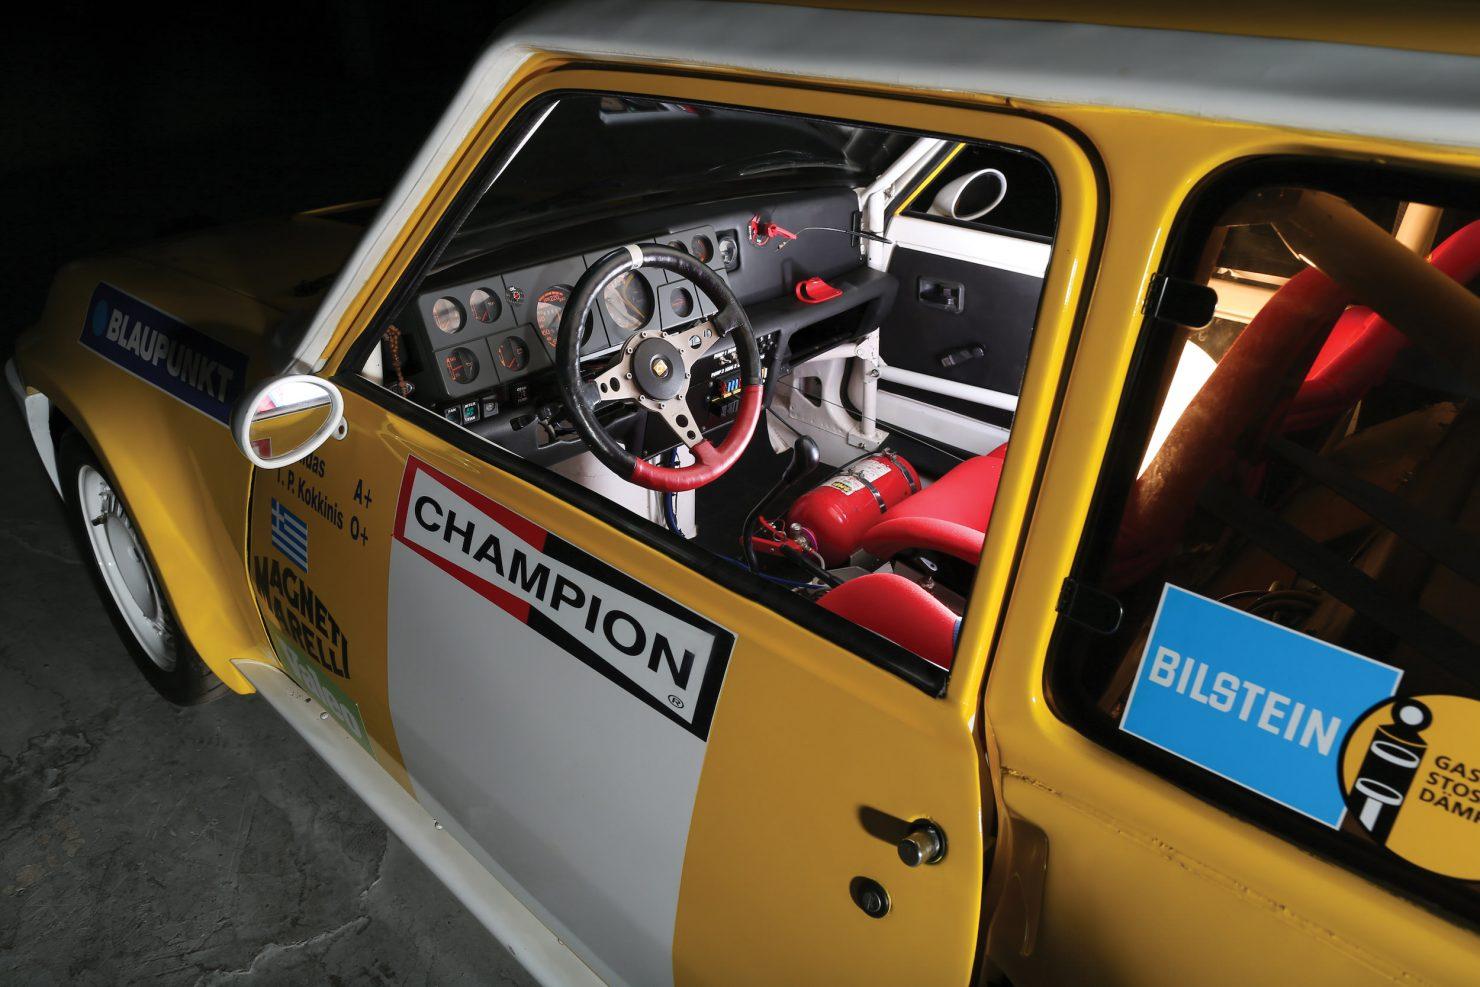 Renault 5 Turbo 3 1480x987 - 1980 Renault 5 Turbo